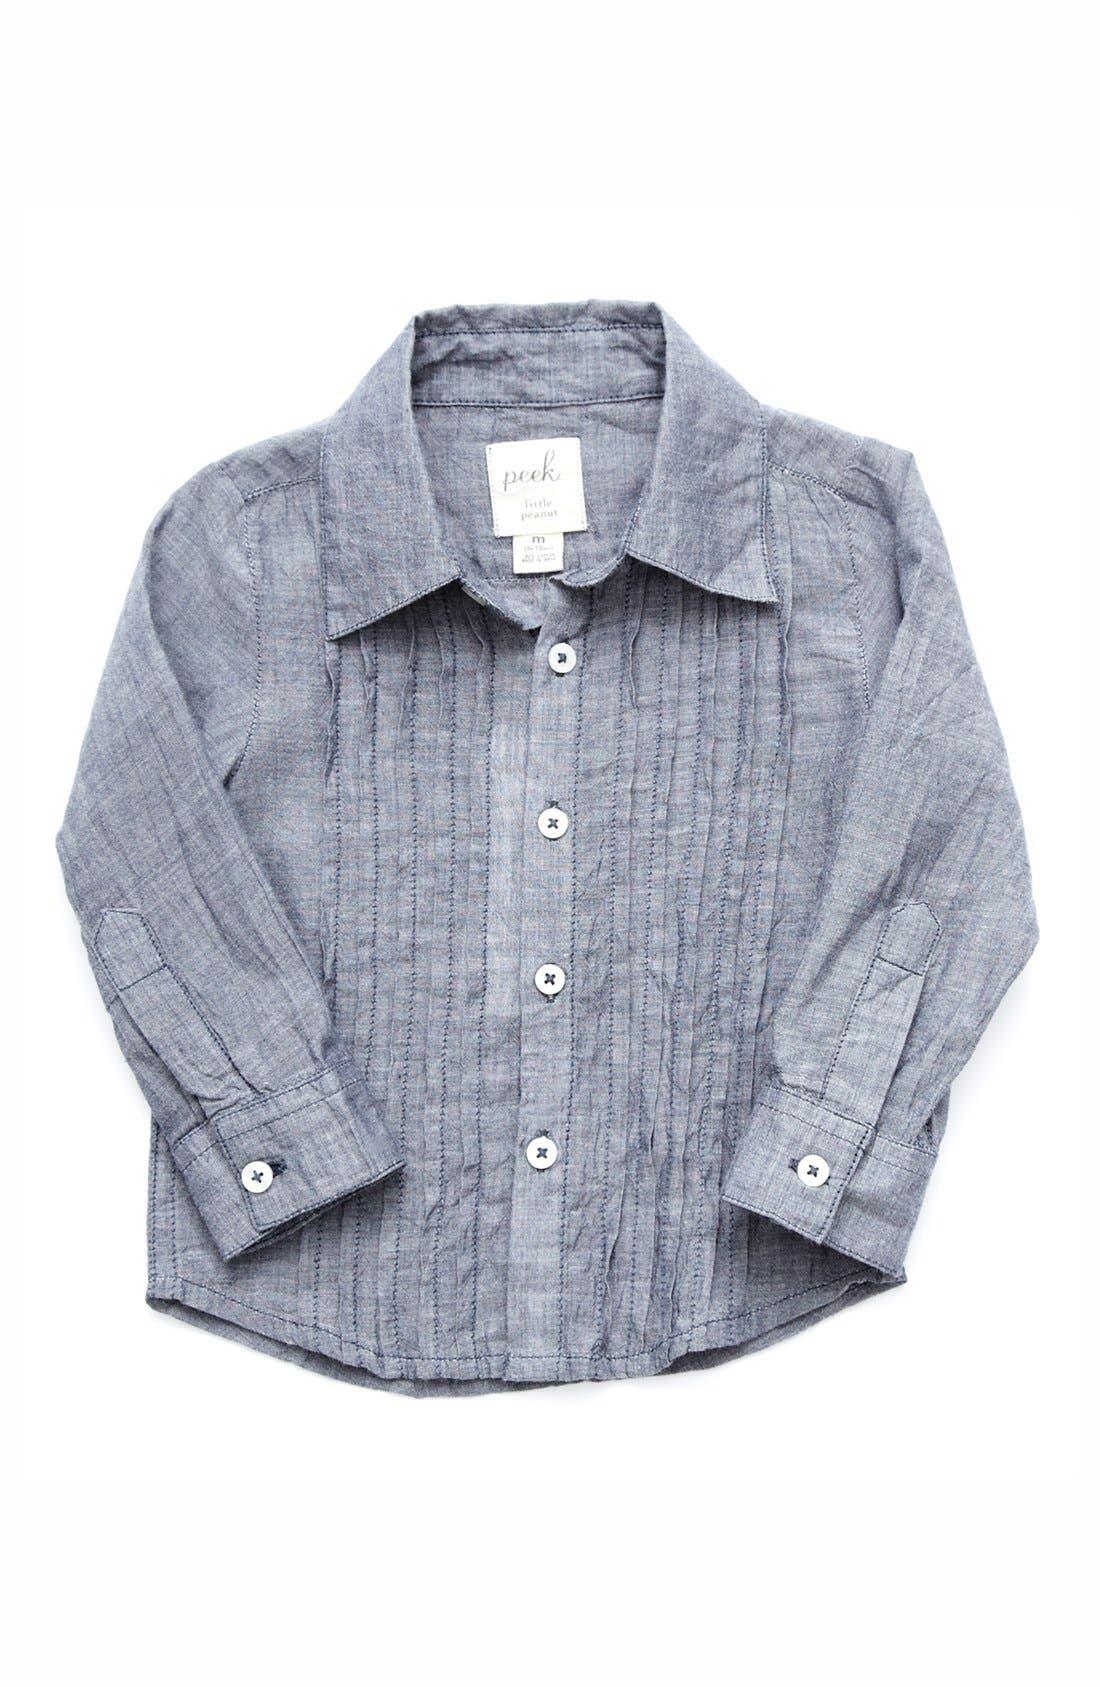 Main Image - Peek 'Arthur' Chambray Sport Shirt (Baby Boys)